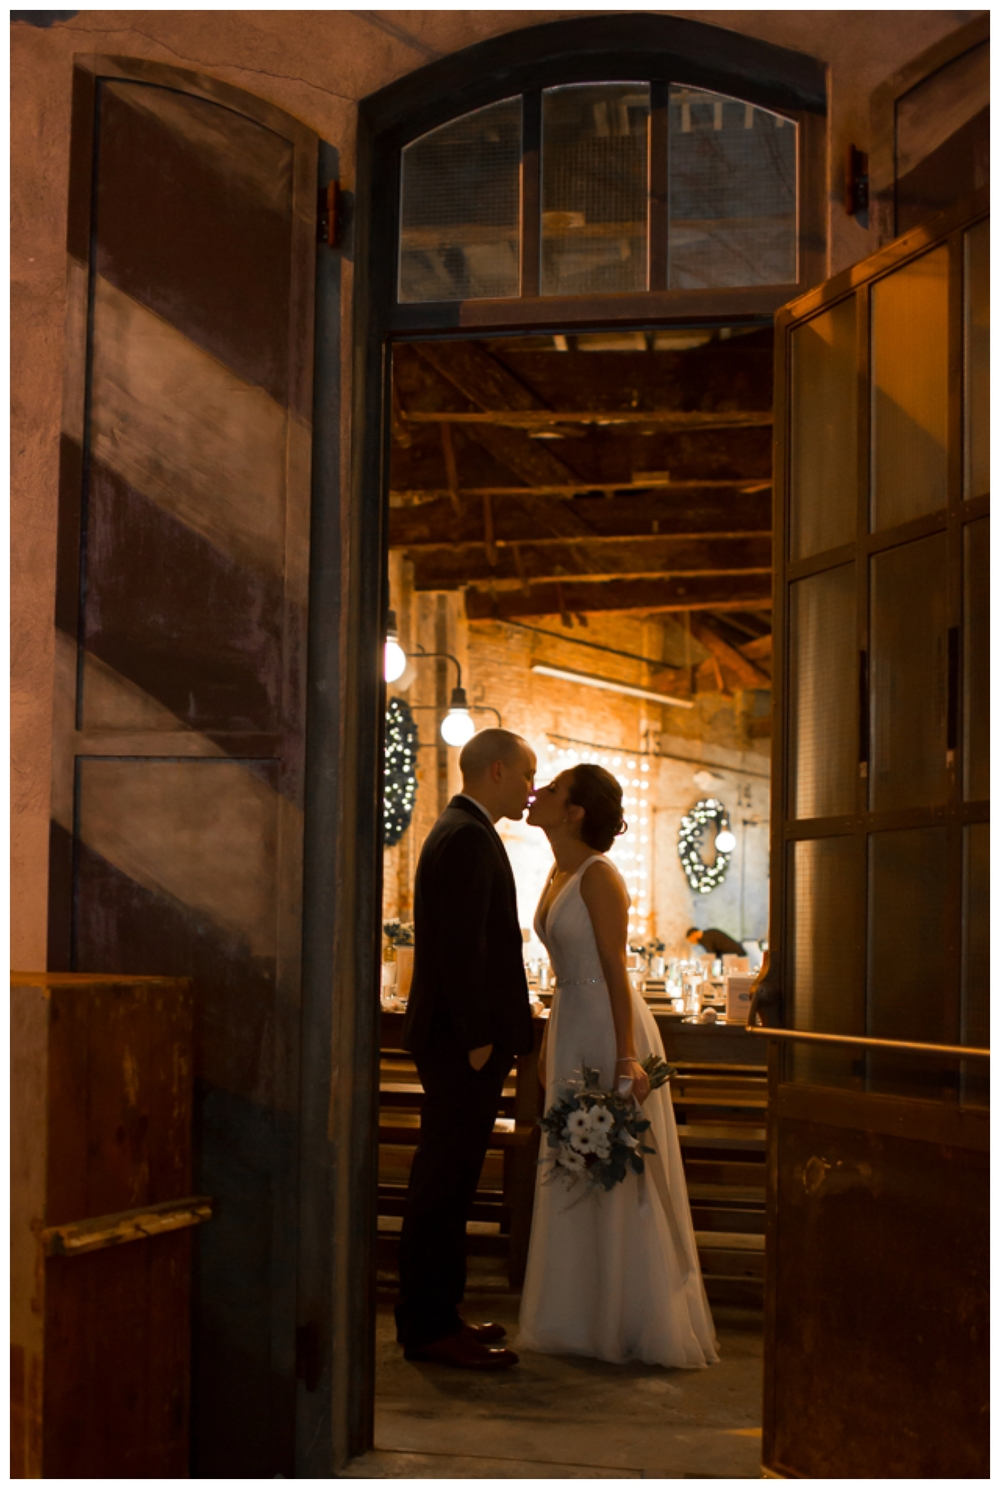 TaylorLaurenBarker - Stephanie&Carmine - NYE Wedding_0006.jpg